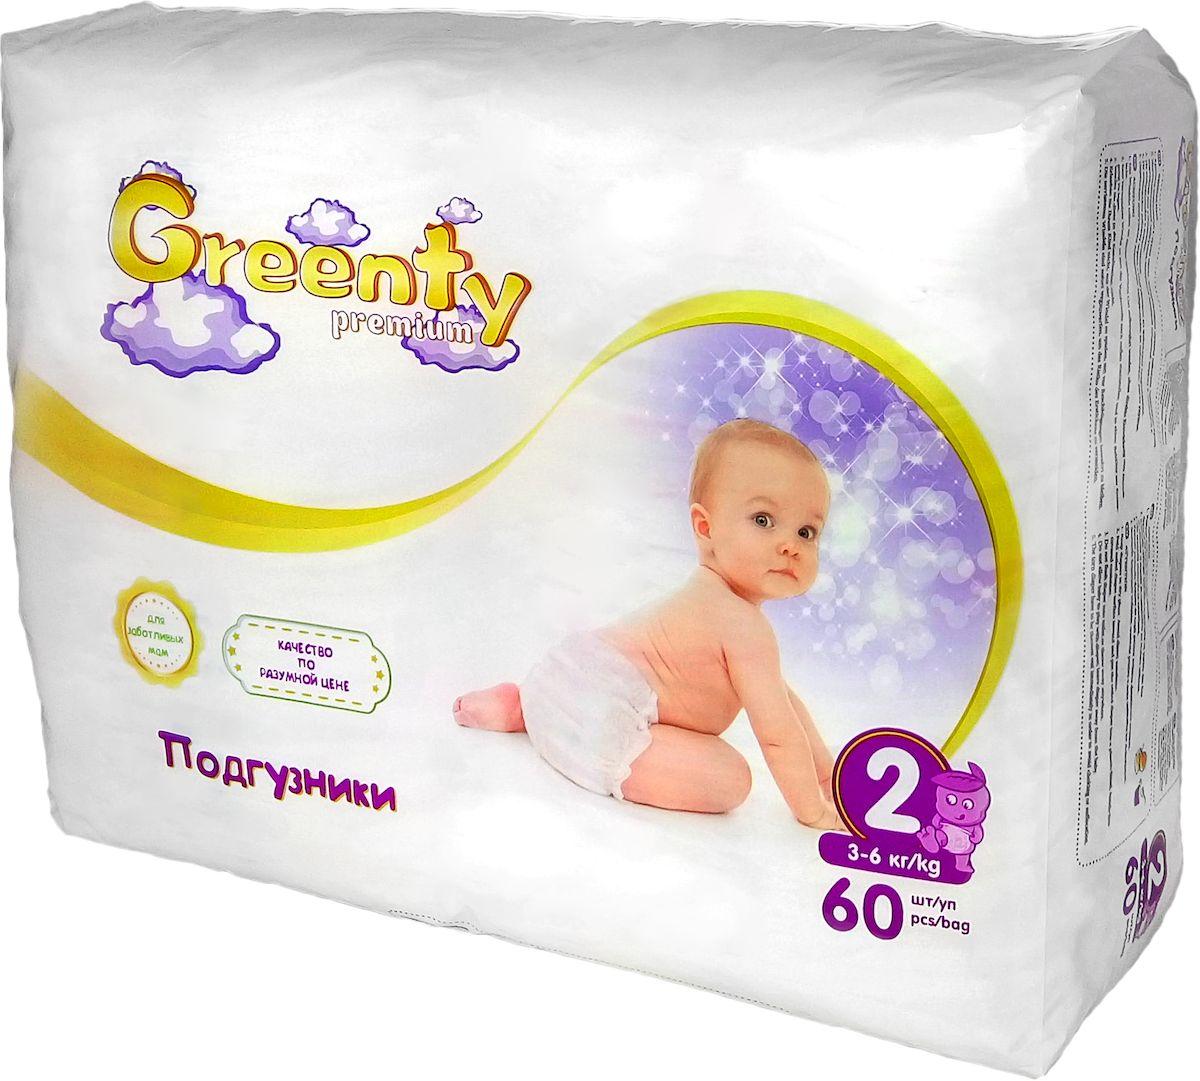 Greenty Подгузники 3-6 кг 60 штGRE-PR-2mGREENTY Одноразовые детские подгузники 3-6 кг (размер 2) 60 шт